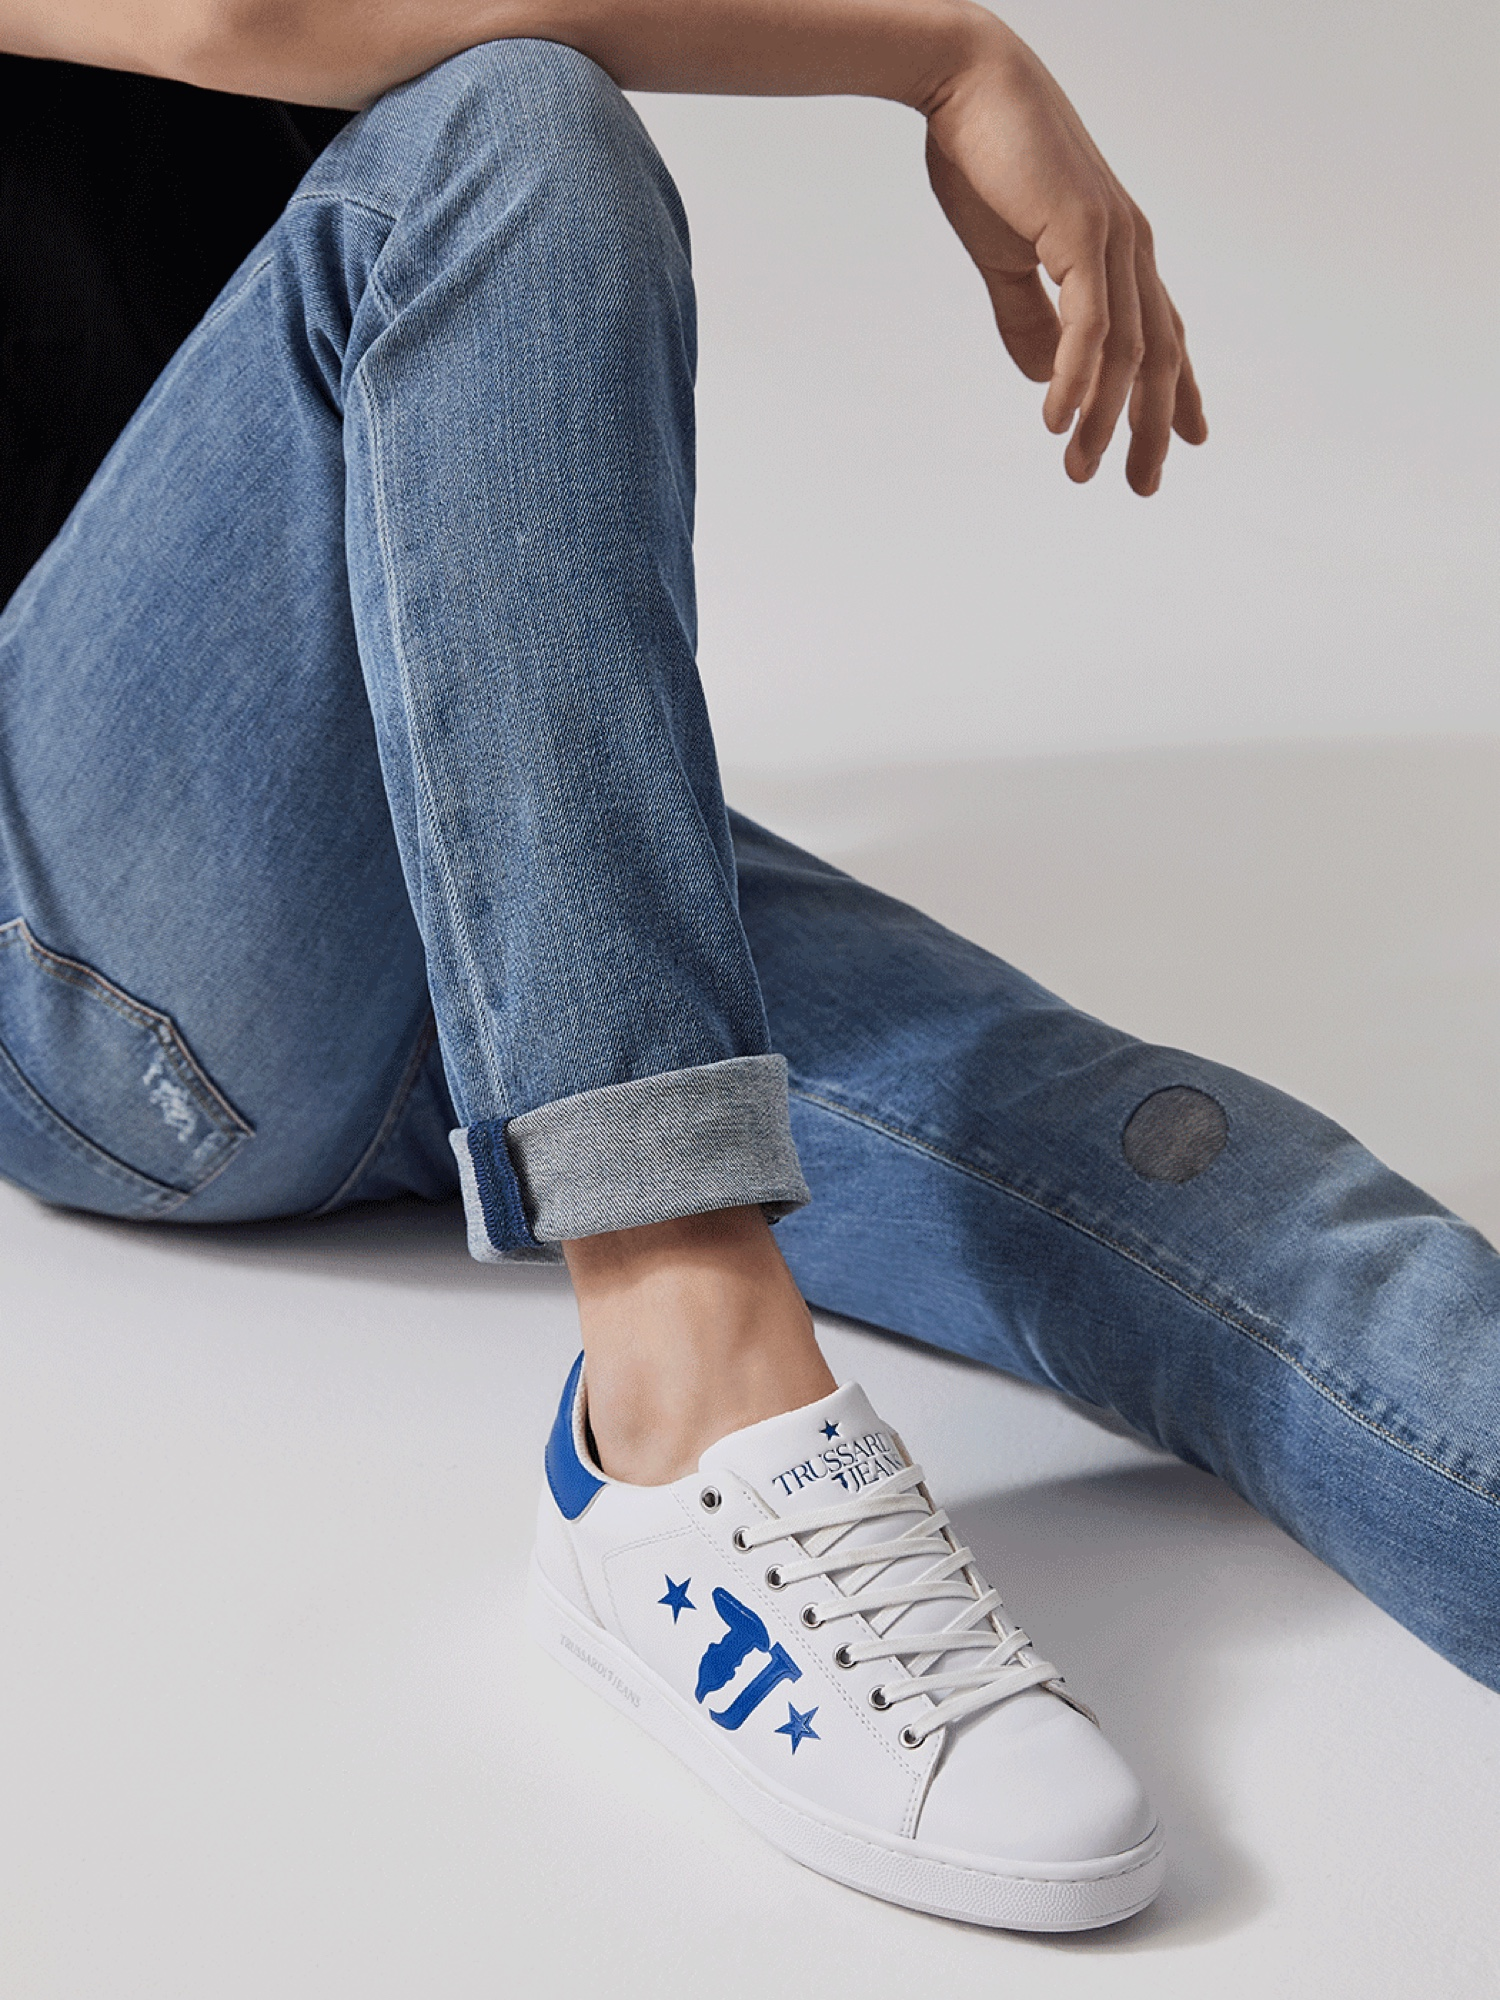 817a17f76b5b Men's shoes | Trussardi ®